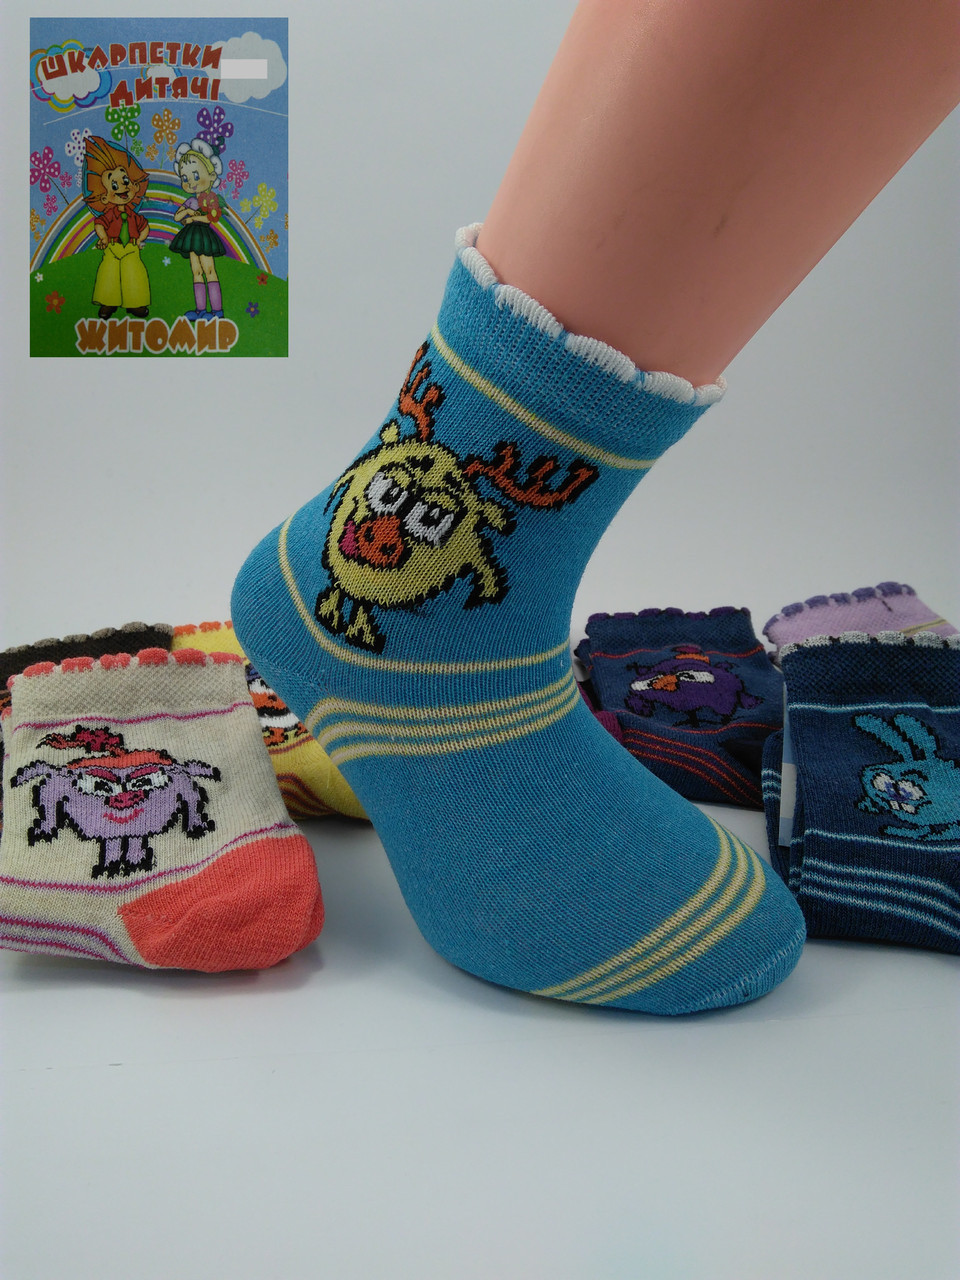 Детские носки 14-16 (22-25 обувь) Смешарики микс